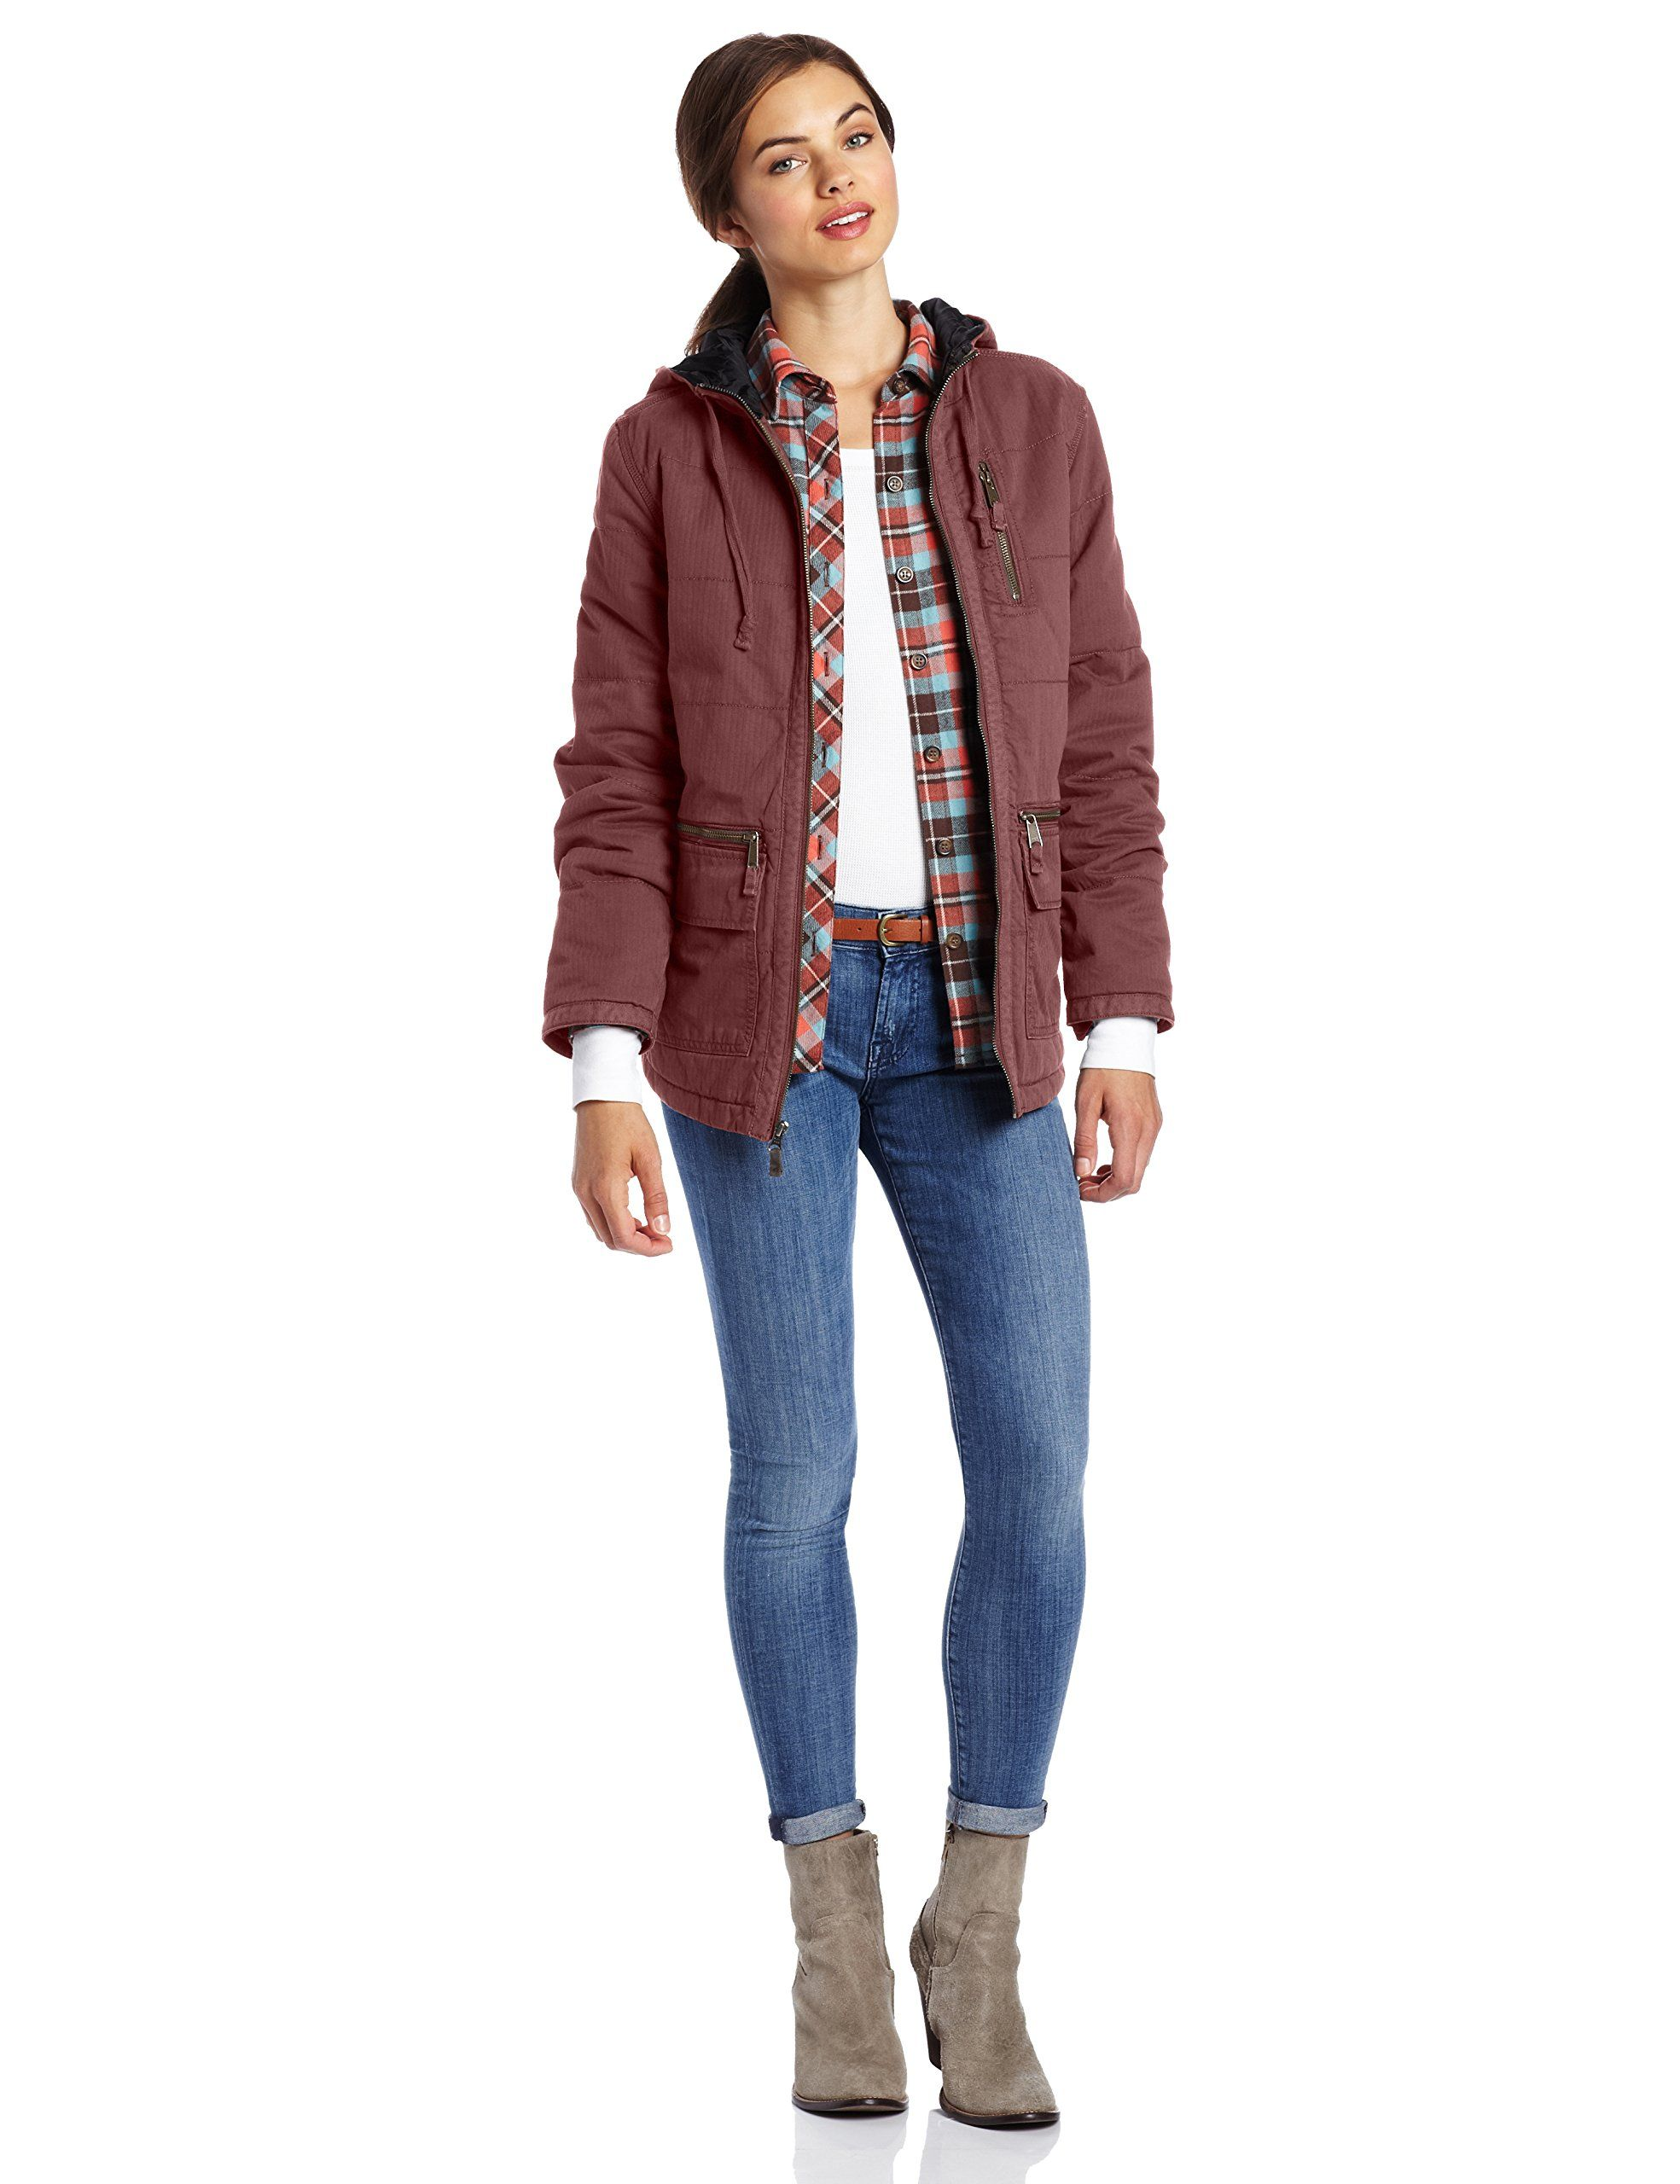 Carhartt Women S Gallatin Jacket At Amazon Women S Coats Shop Carhartt Women Jackets Coats For Women [ 2560 x 1969 Pixel ]